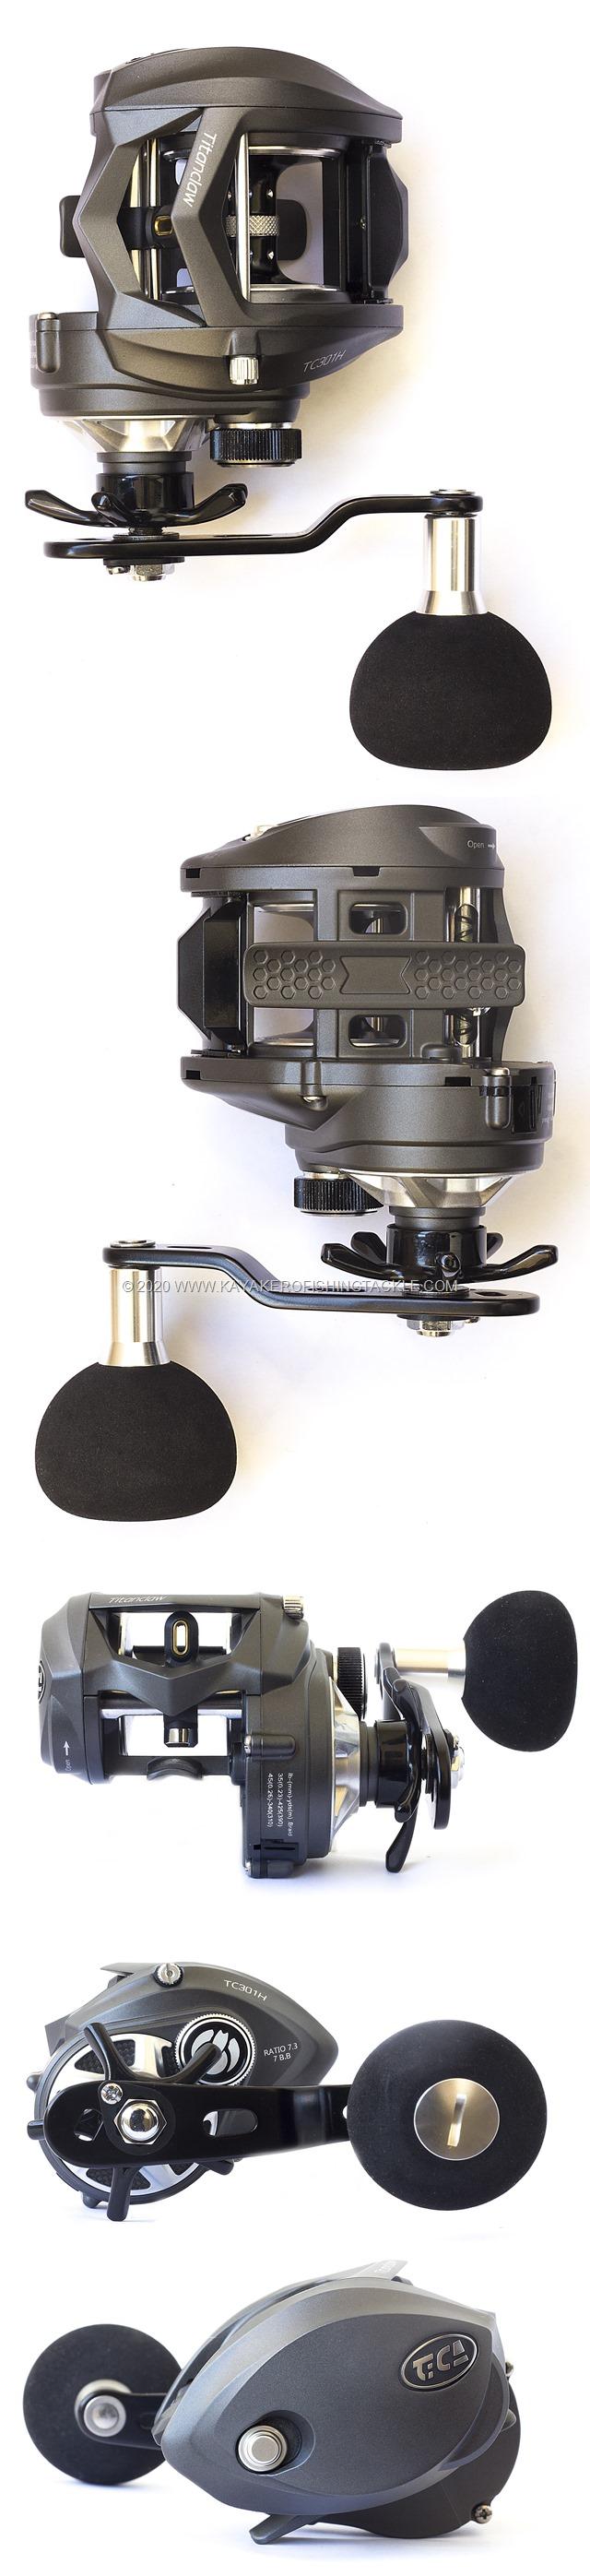 TITANCLAW-TC301H-viste-globali